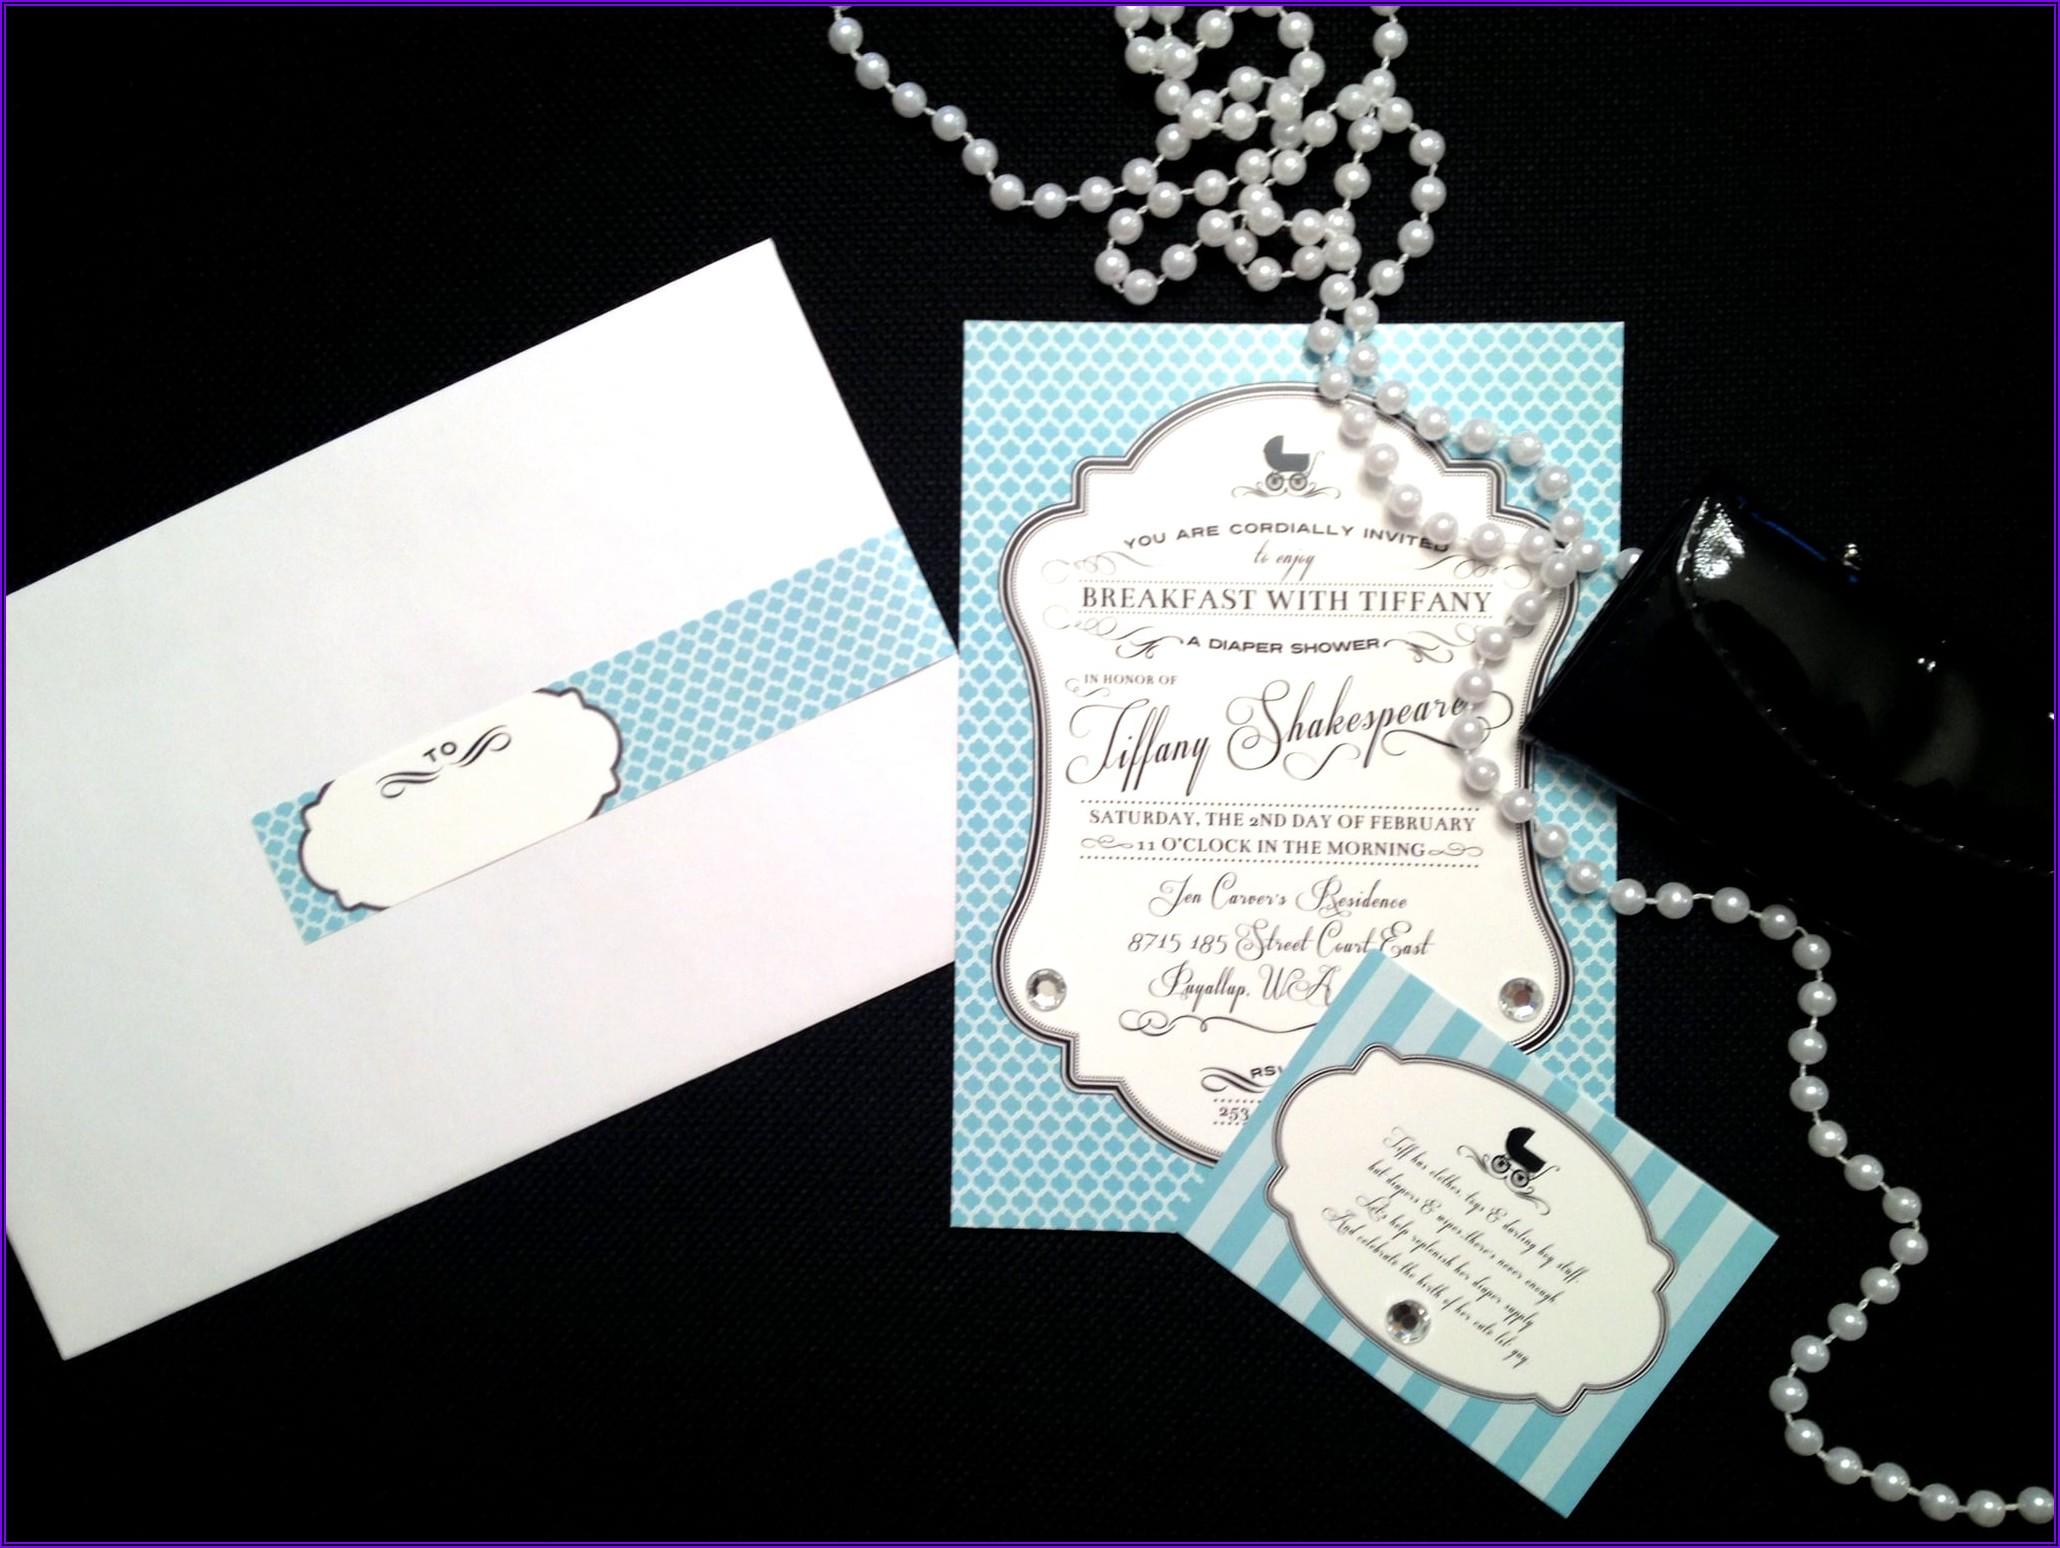 Breakfast At Tiffany's Baby Shower Invitations